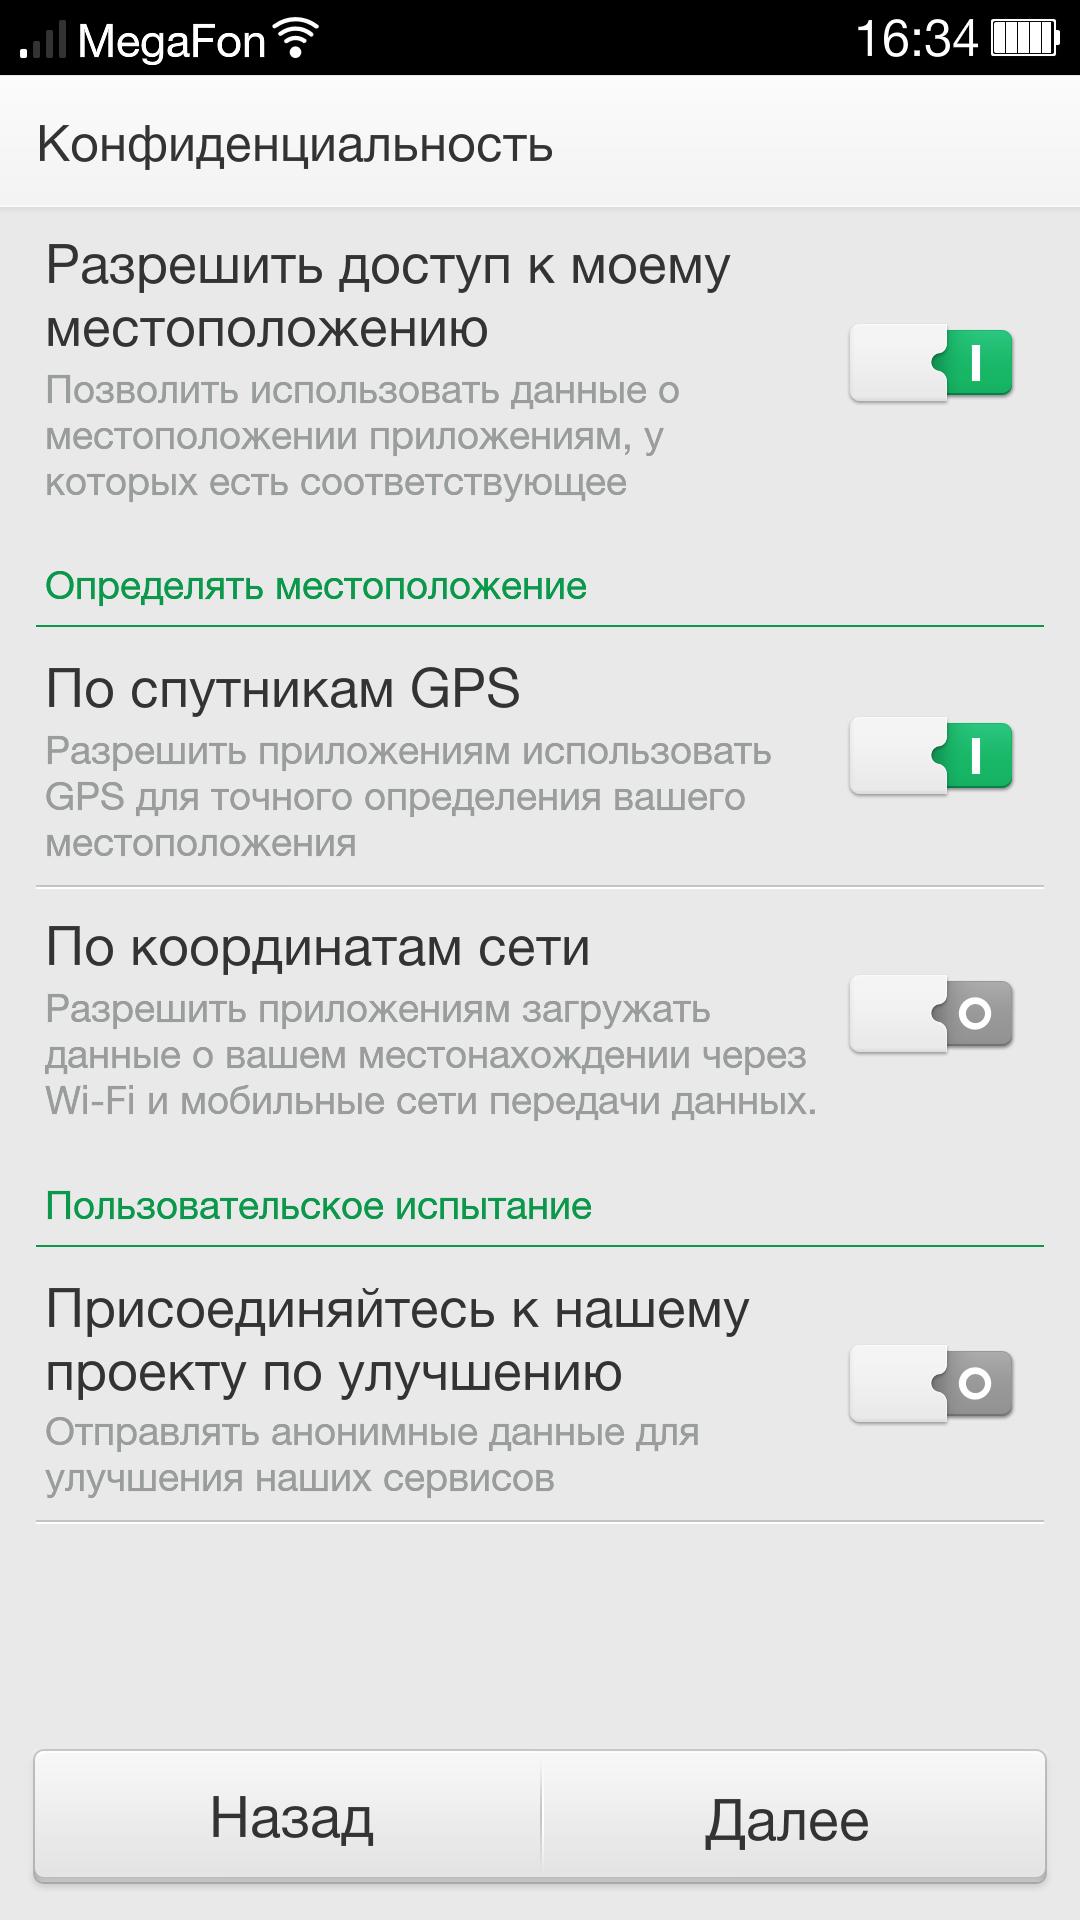 Screenshot_2013-10-19-16-34-22